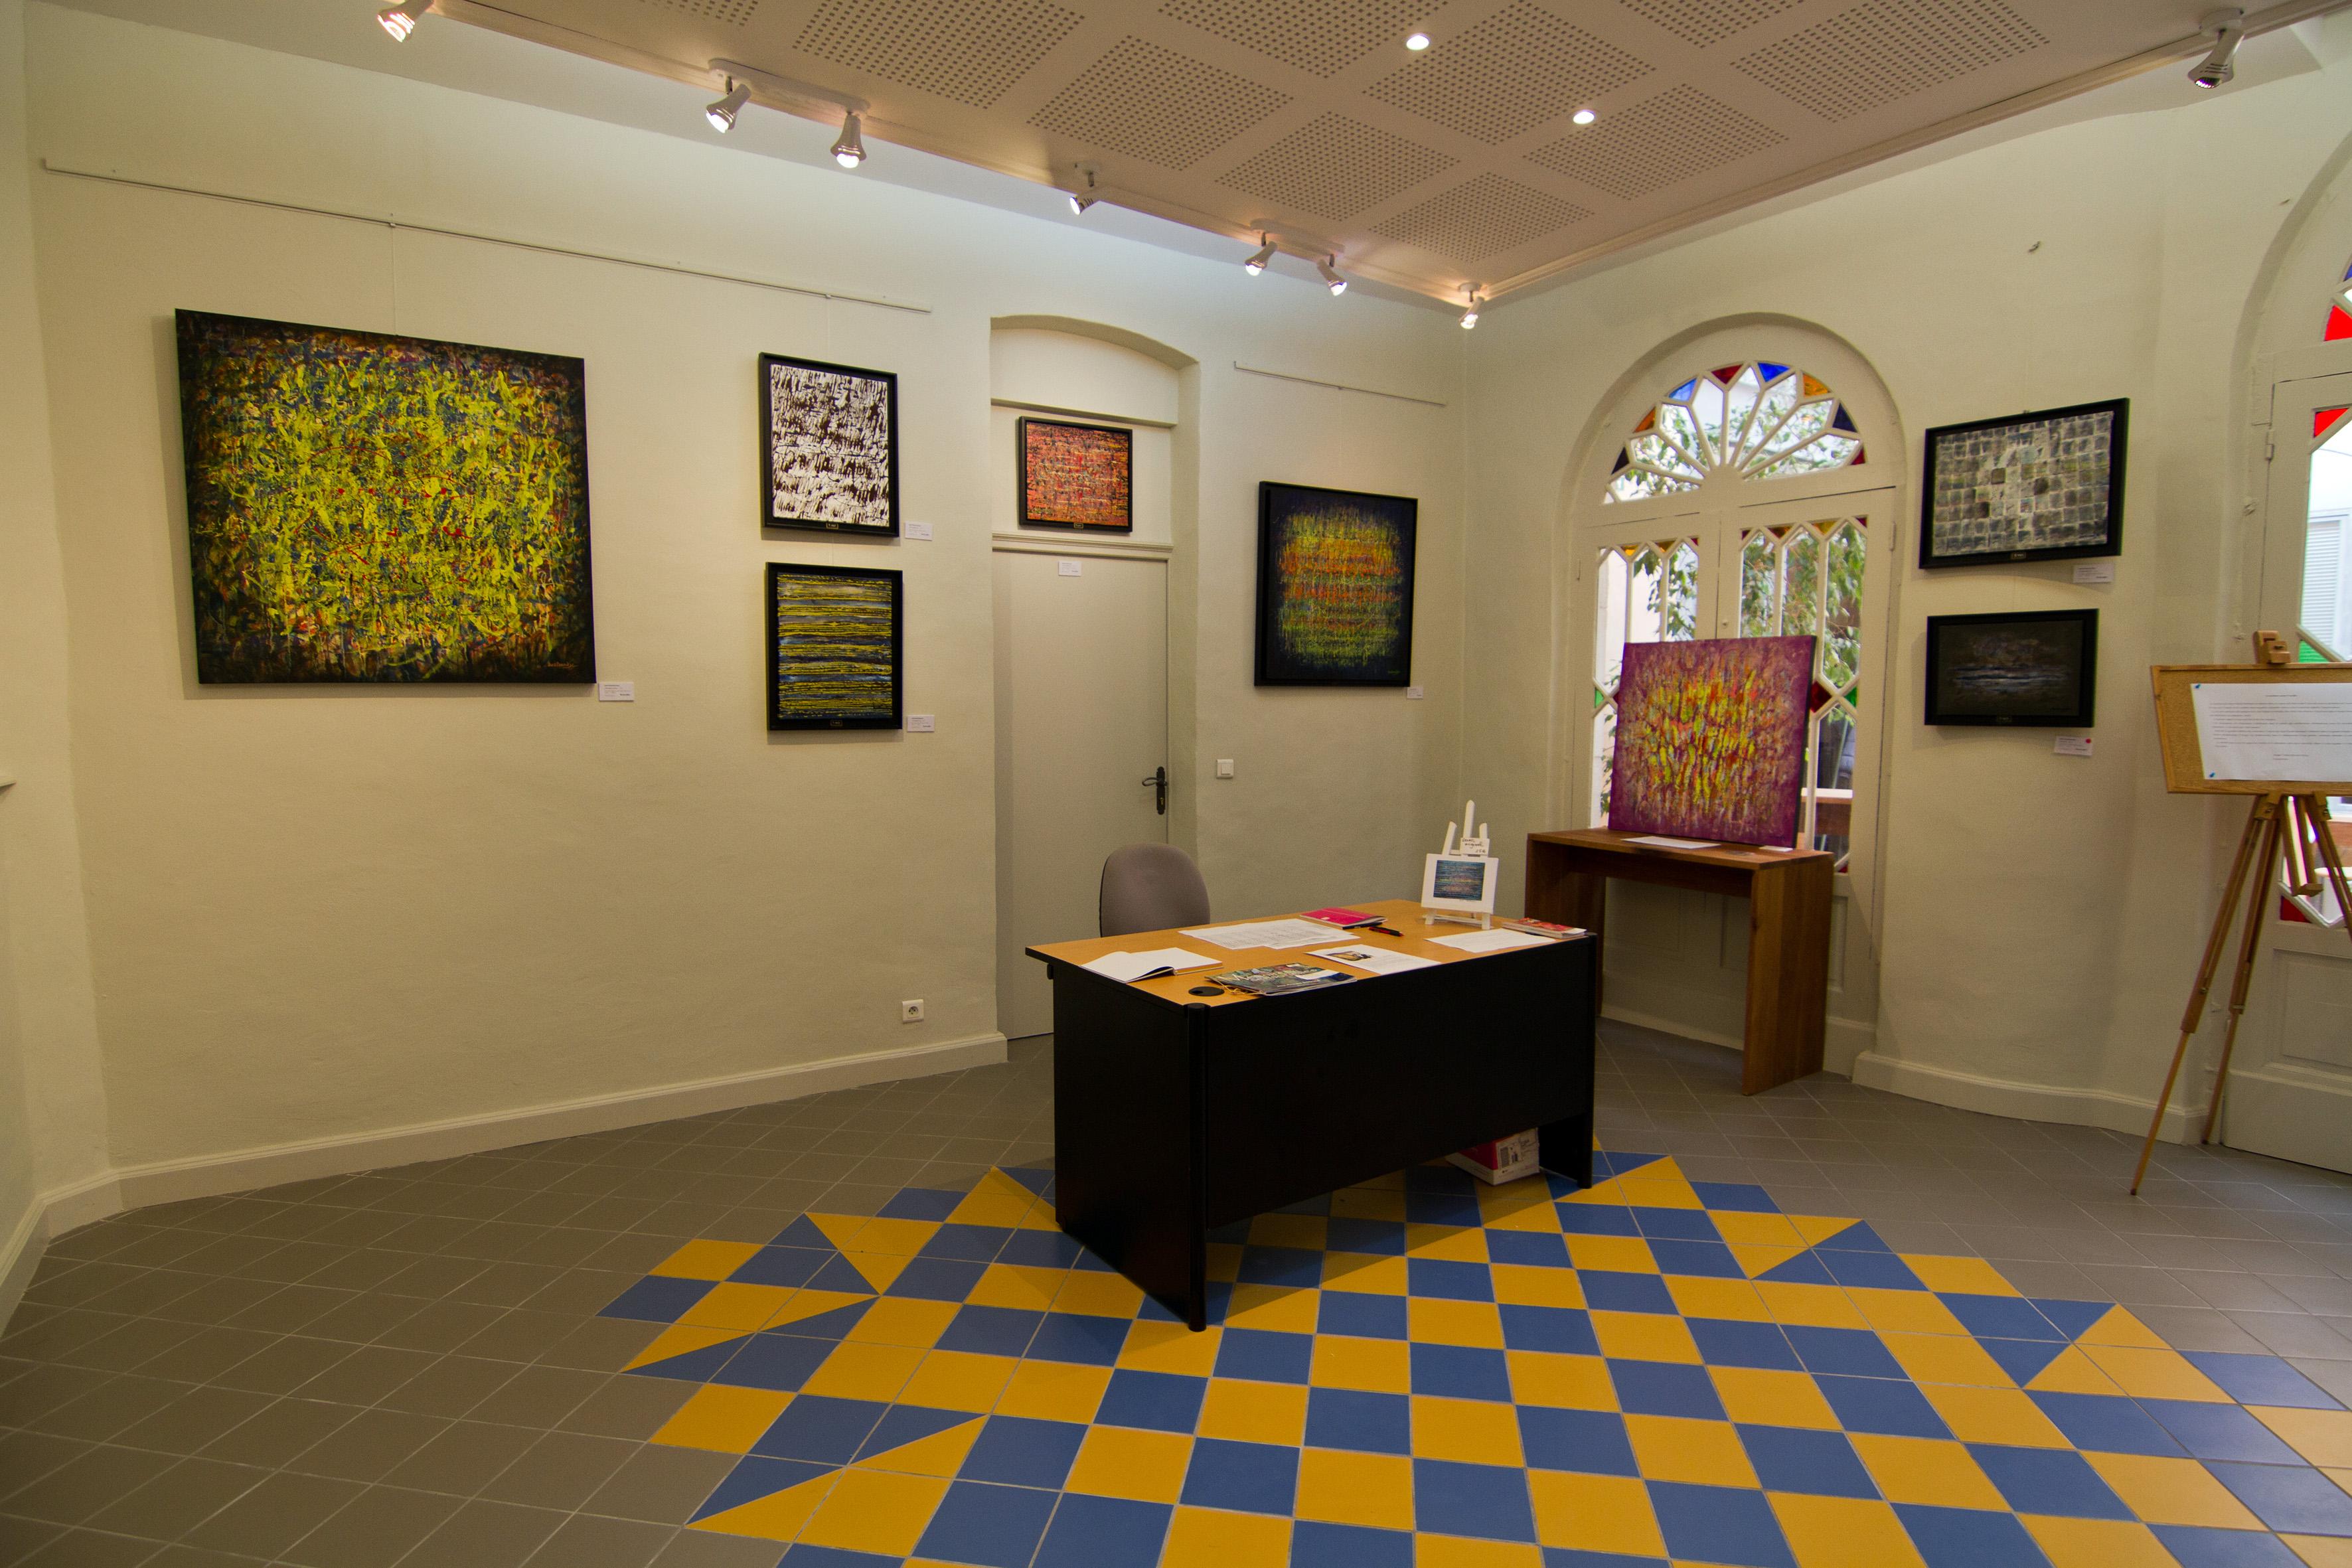 Galerie d'Art l'Arcade Saint-Clar_Jean-Claude Bertrand-5914-170707